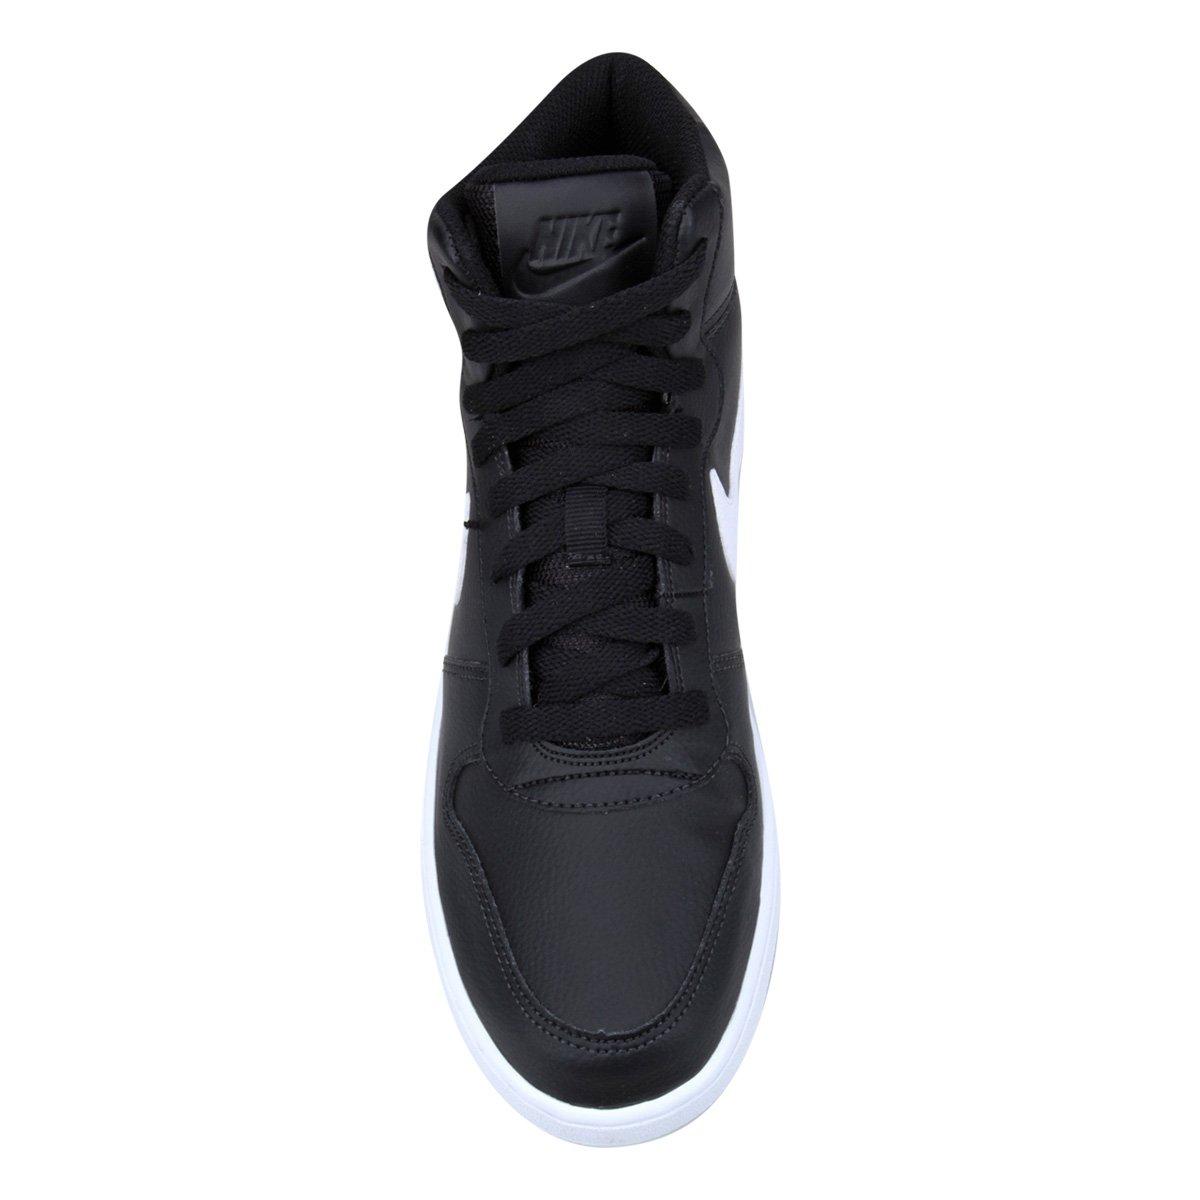 627660af11a Tênis Couro Cano Alto Nike Ebernon Mid Masculino